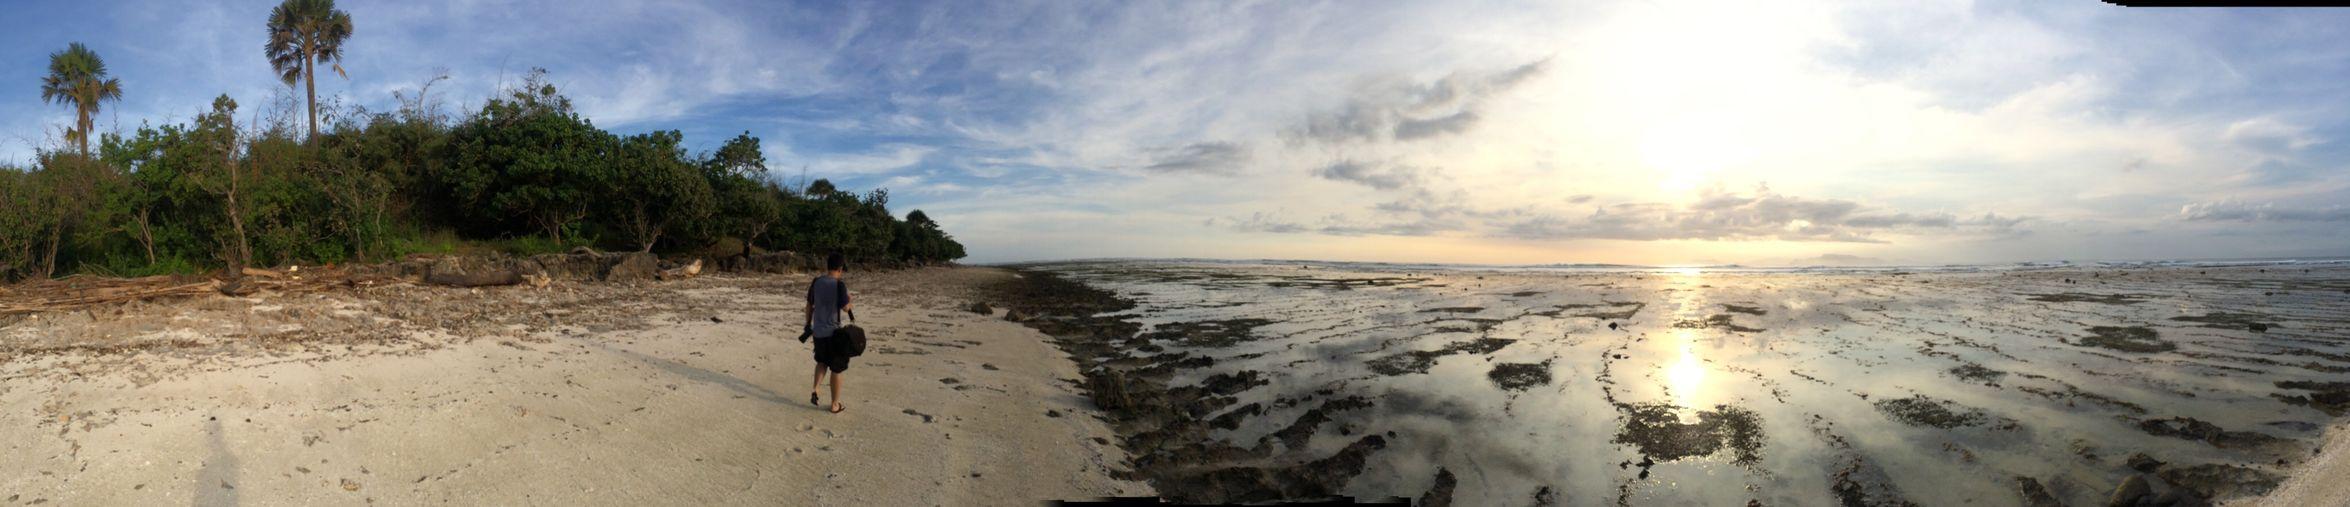 Island corner Sea Tranquil Scene Water Beach Tranquility Scenics Horizon Over Water Panoramic Sky Coastline Beauty In Nature Ocean Cloud Calm Idyllic Sand Shore Nature Sun Seascape Iphone5s